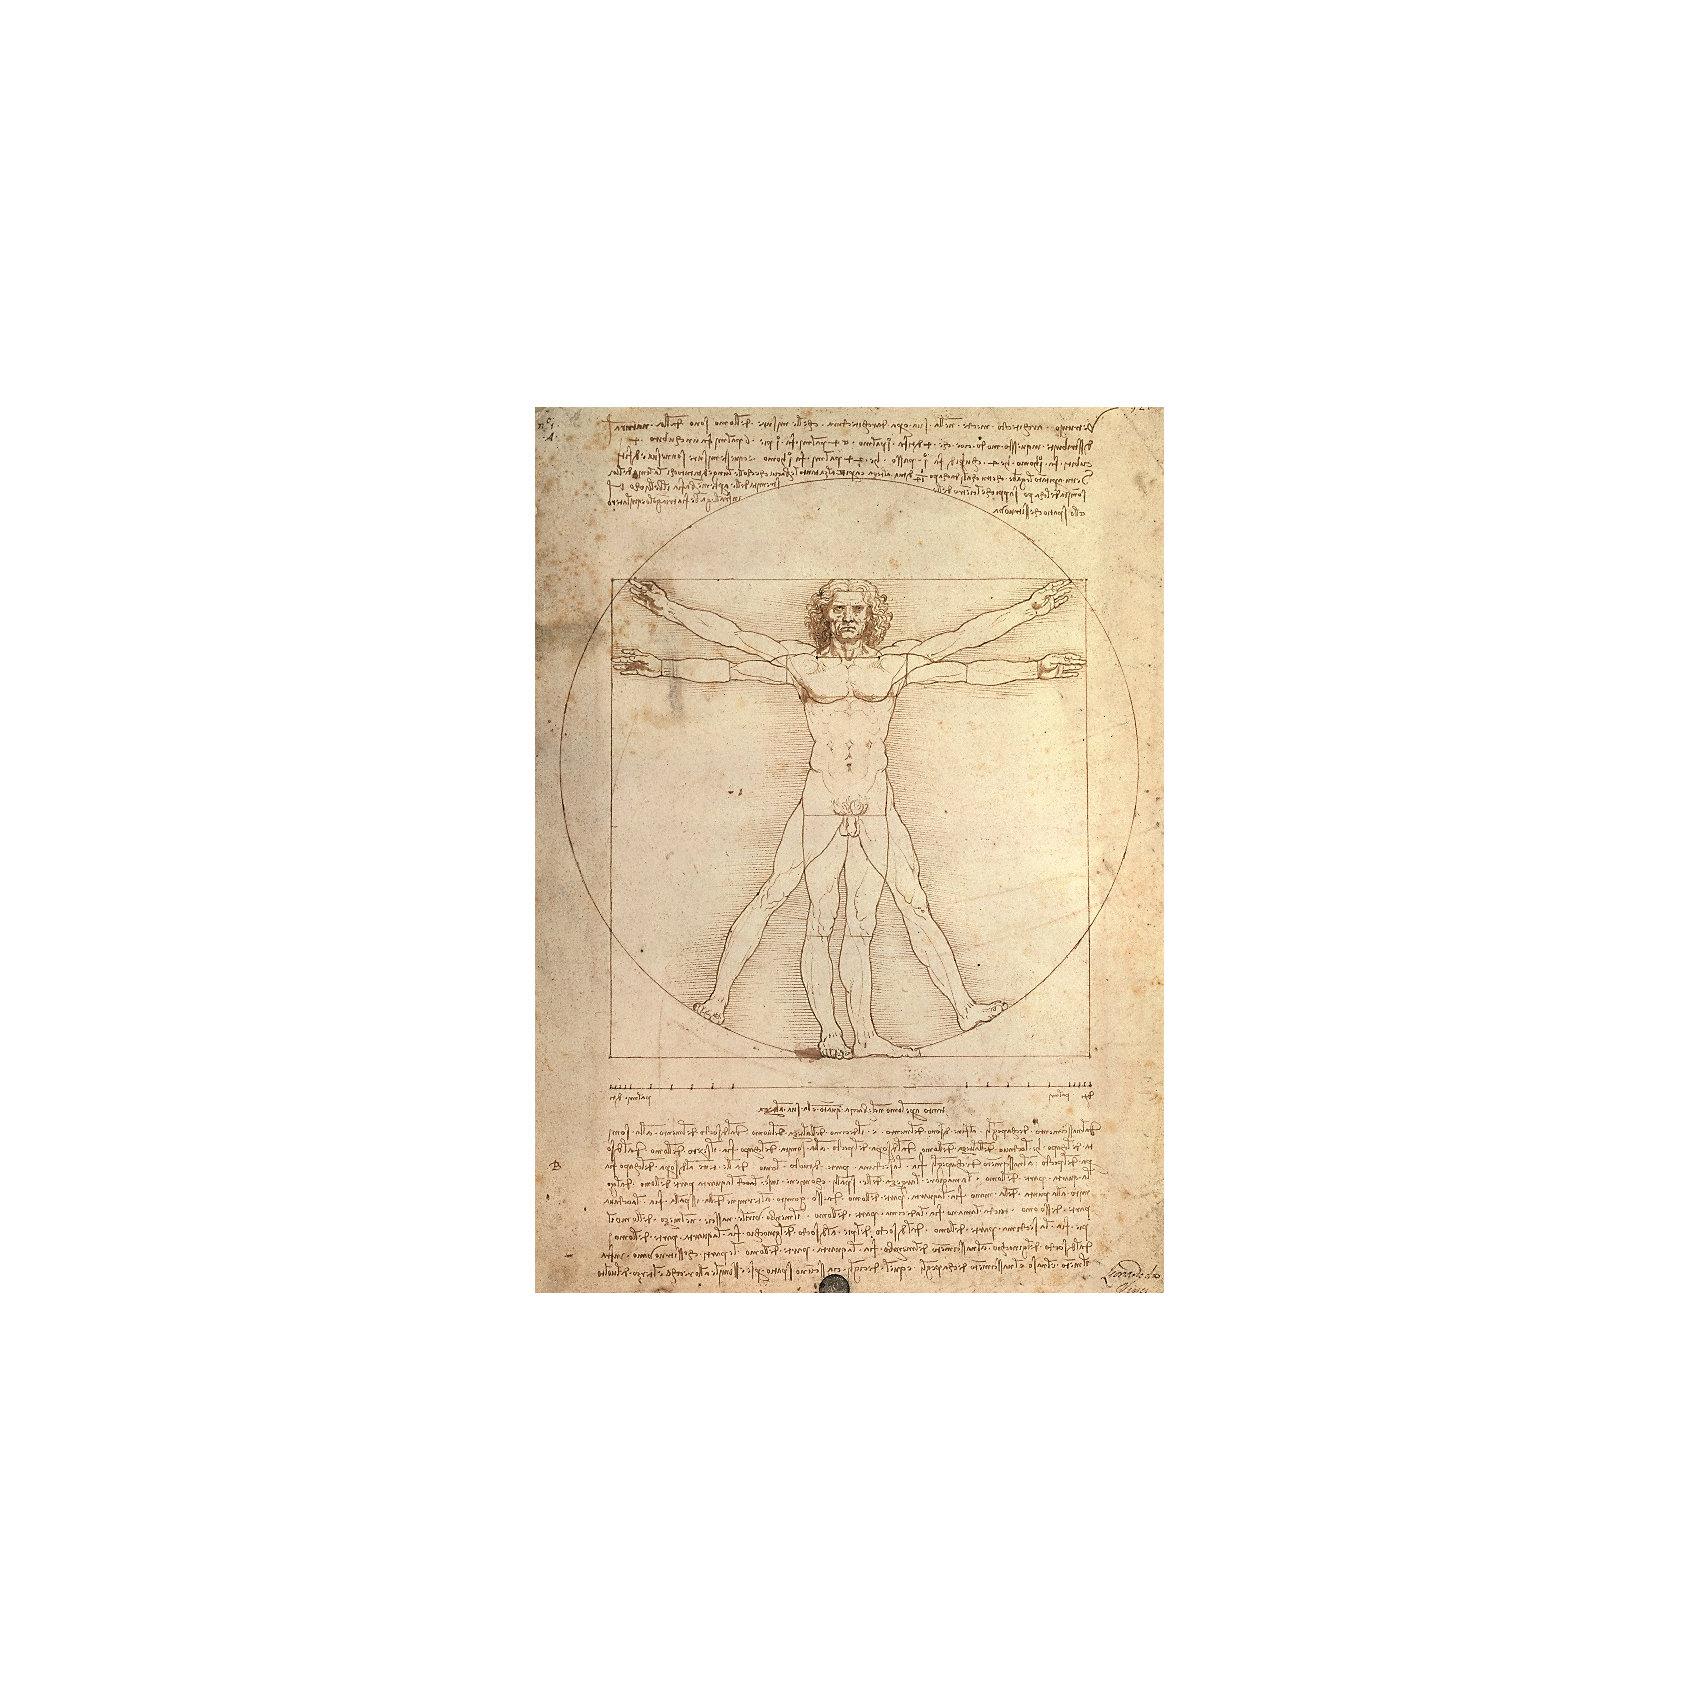 Ravensburger Пазл «Витрувианский человек» 1000 деталей, Ravensburger ravensburger ravensburger 1000